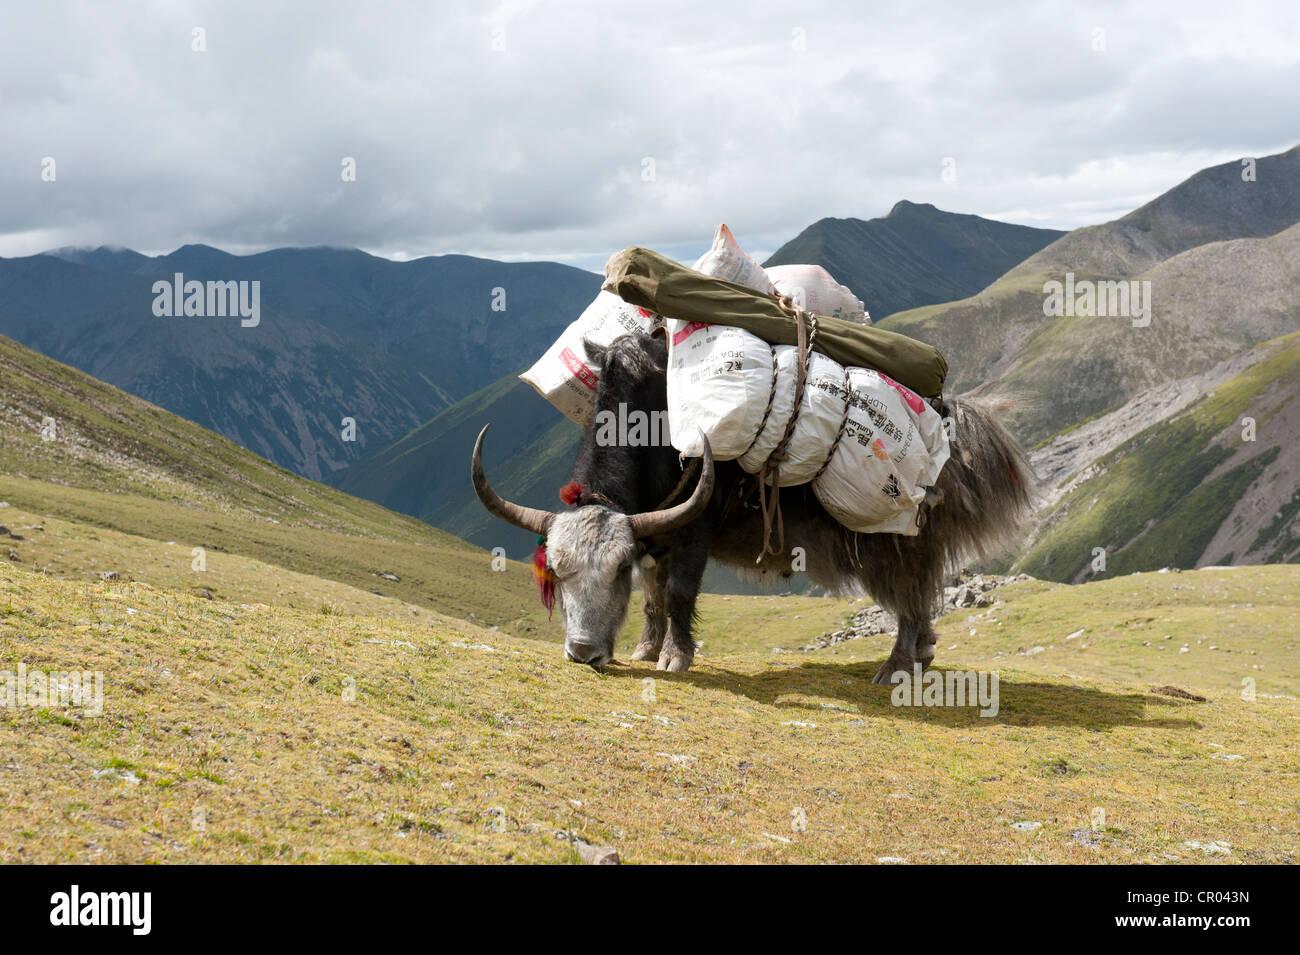 Loaded Yak (Bos mutus) grazing on the grassland in front of high mountains, near the Chitu-La Pass, Himalaya Range - Stock Image